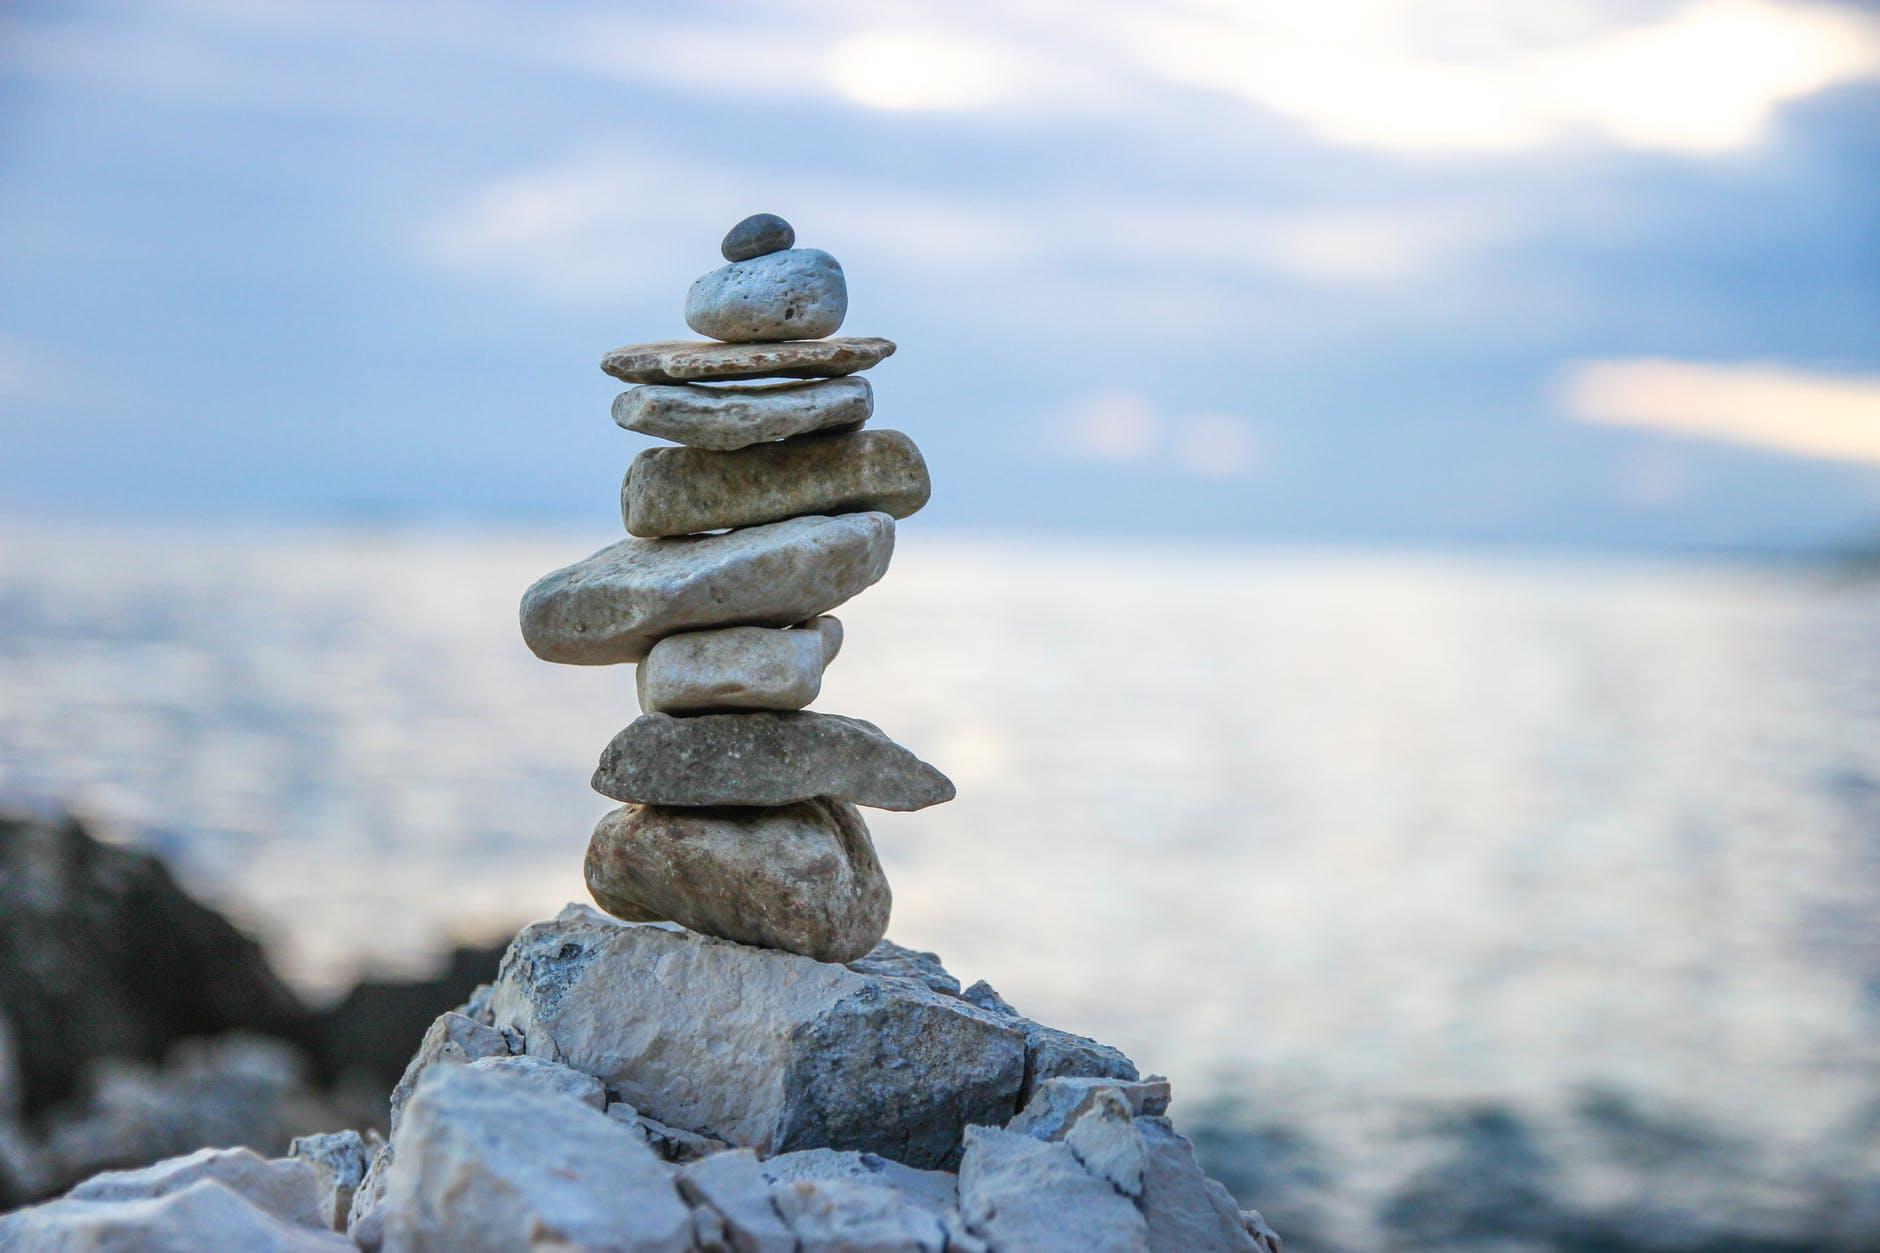 stack of gray stones